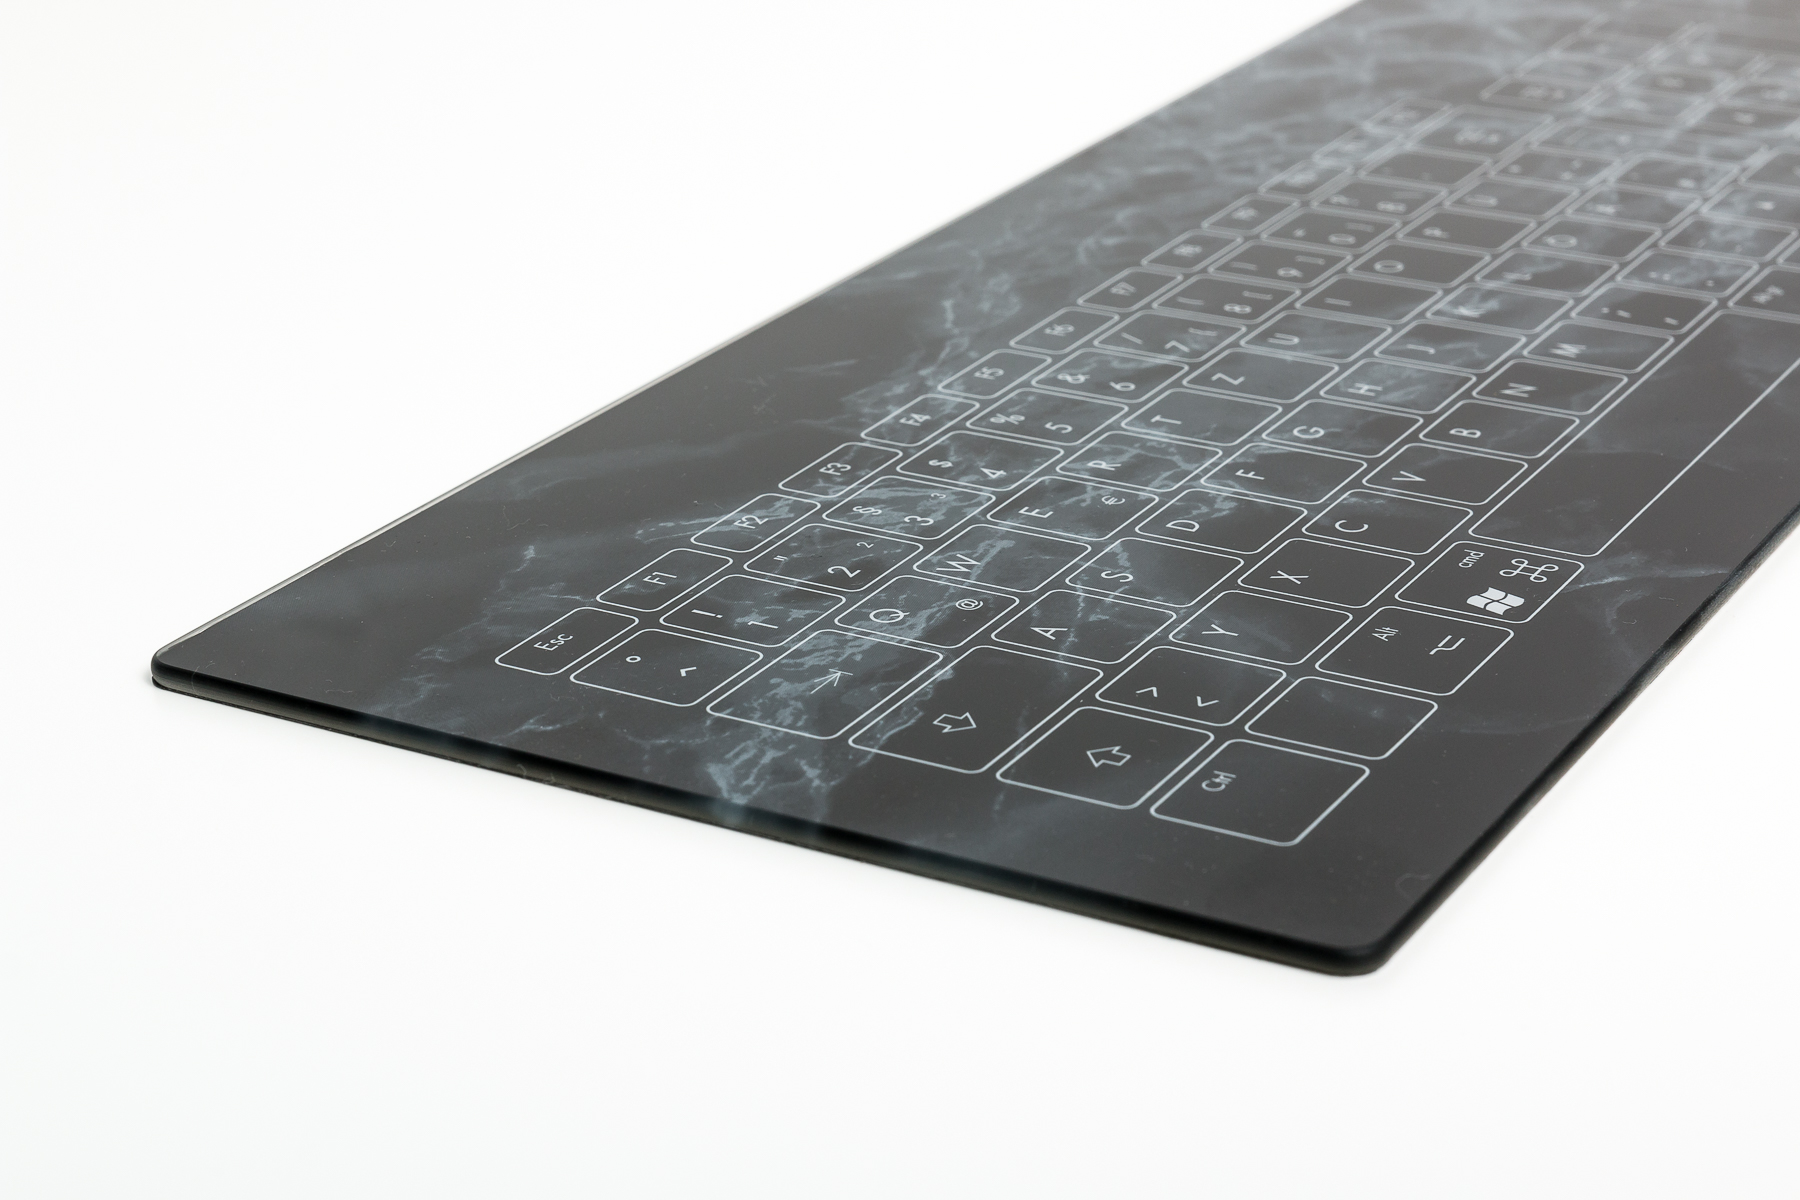 design-glass-keyboard-black-individual-print